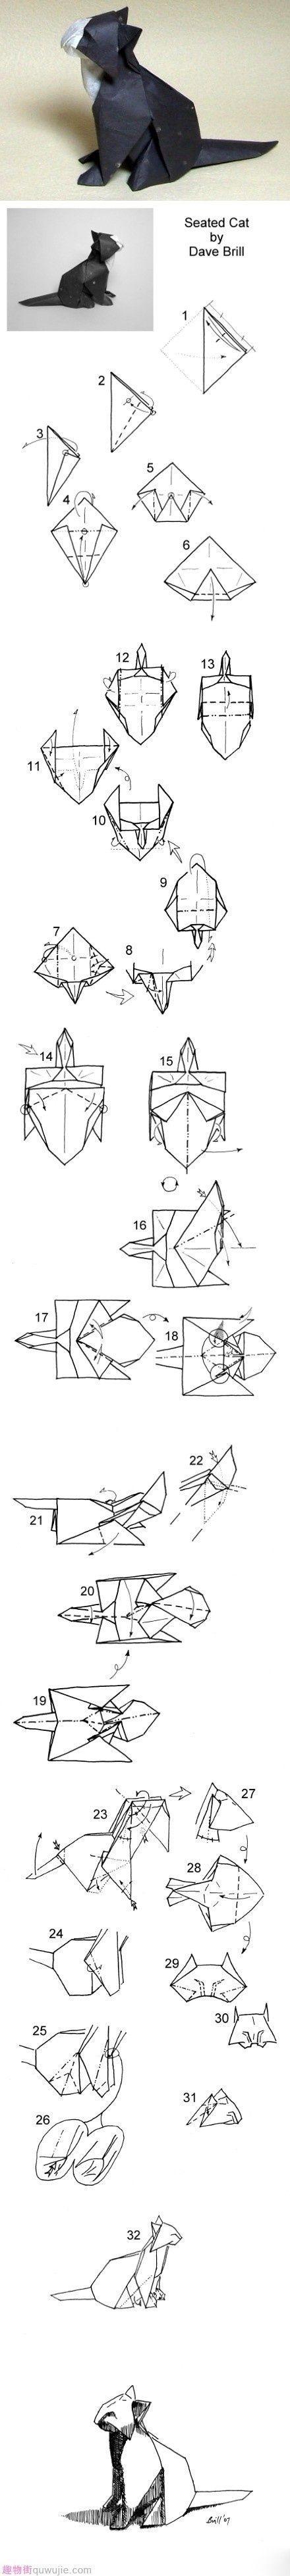 Origami Seated Cat Catpaper Pinterest And Craft Kusudama Diagrams